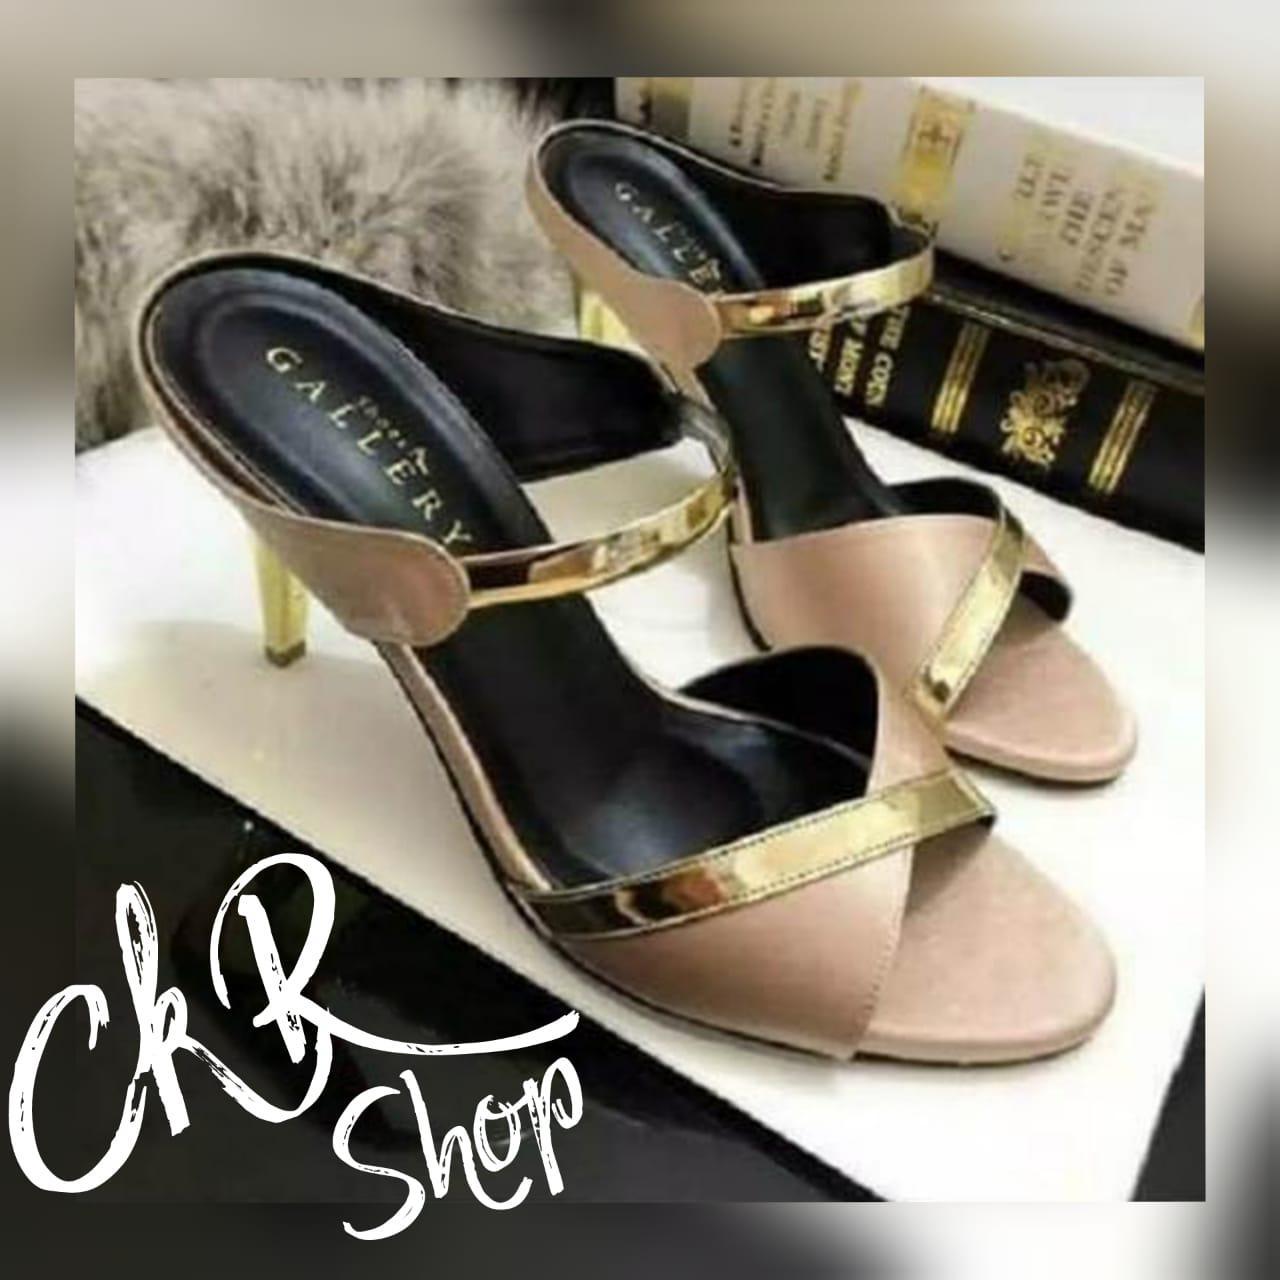 CKR Shop - High Heels Wonder Girl